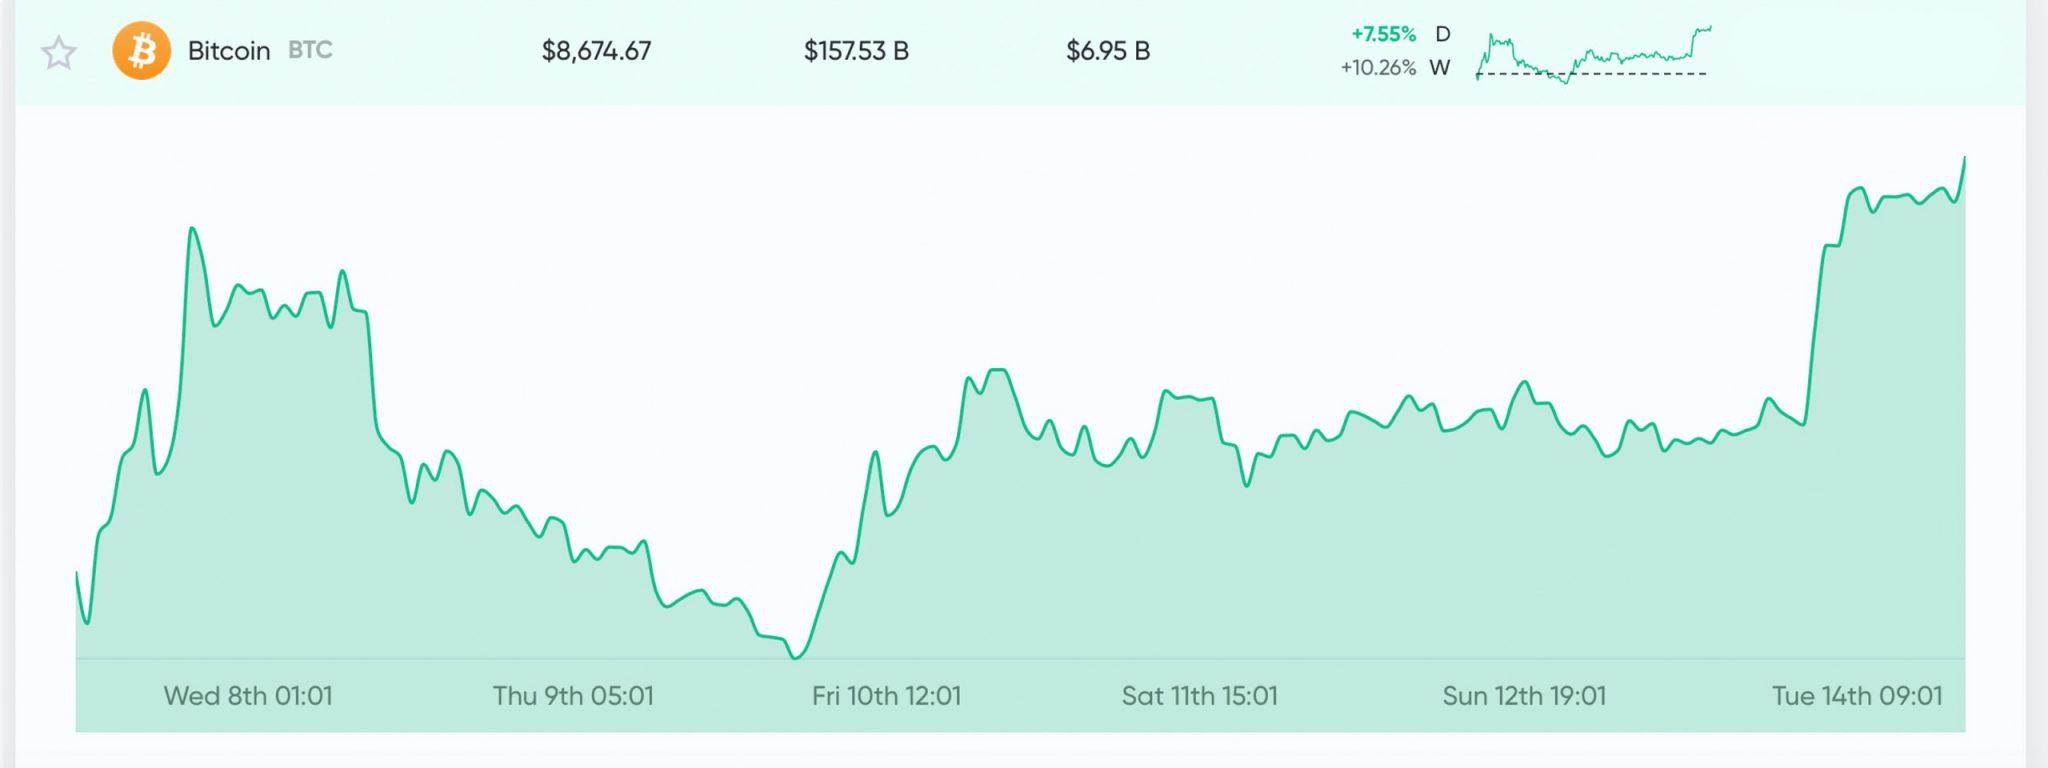 cryptocurrency market cap jan 2021